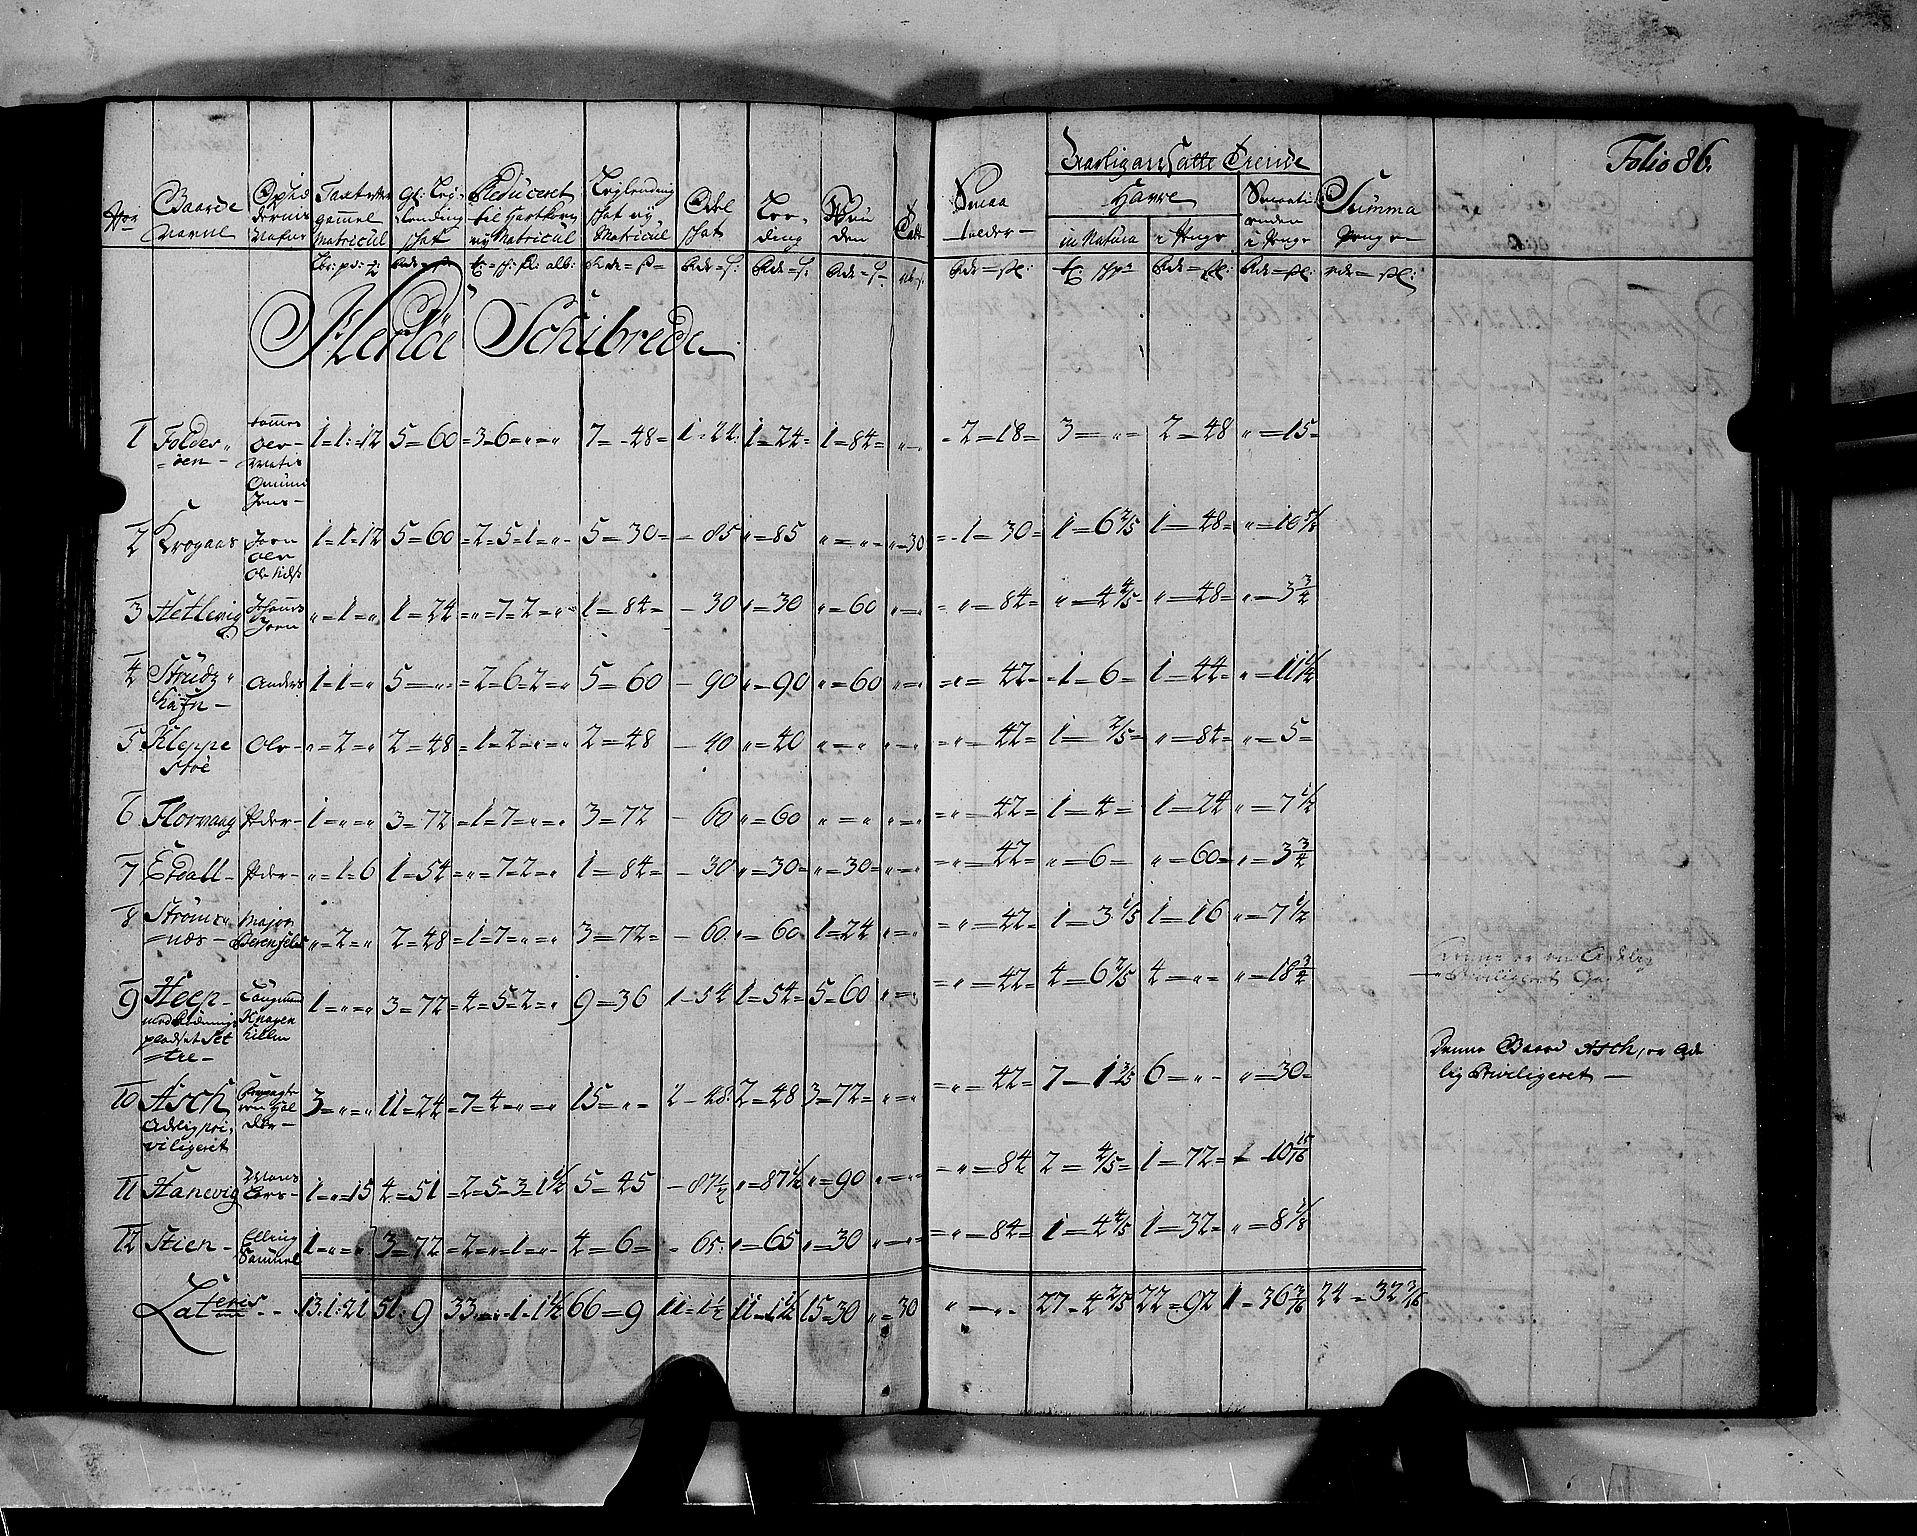 RA, Rentekammeret inntil 1814, Realistisk ordnet avdeling, N/Nb/Nbf/L0140: Nordhordland matrikkelprotokoll, 1723, s. 85b-86a